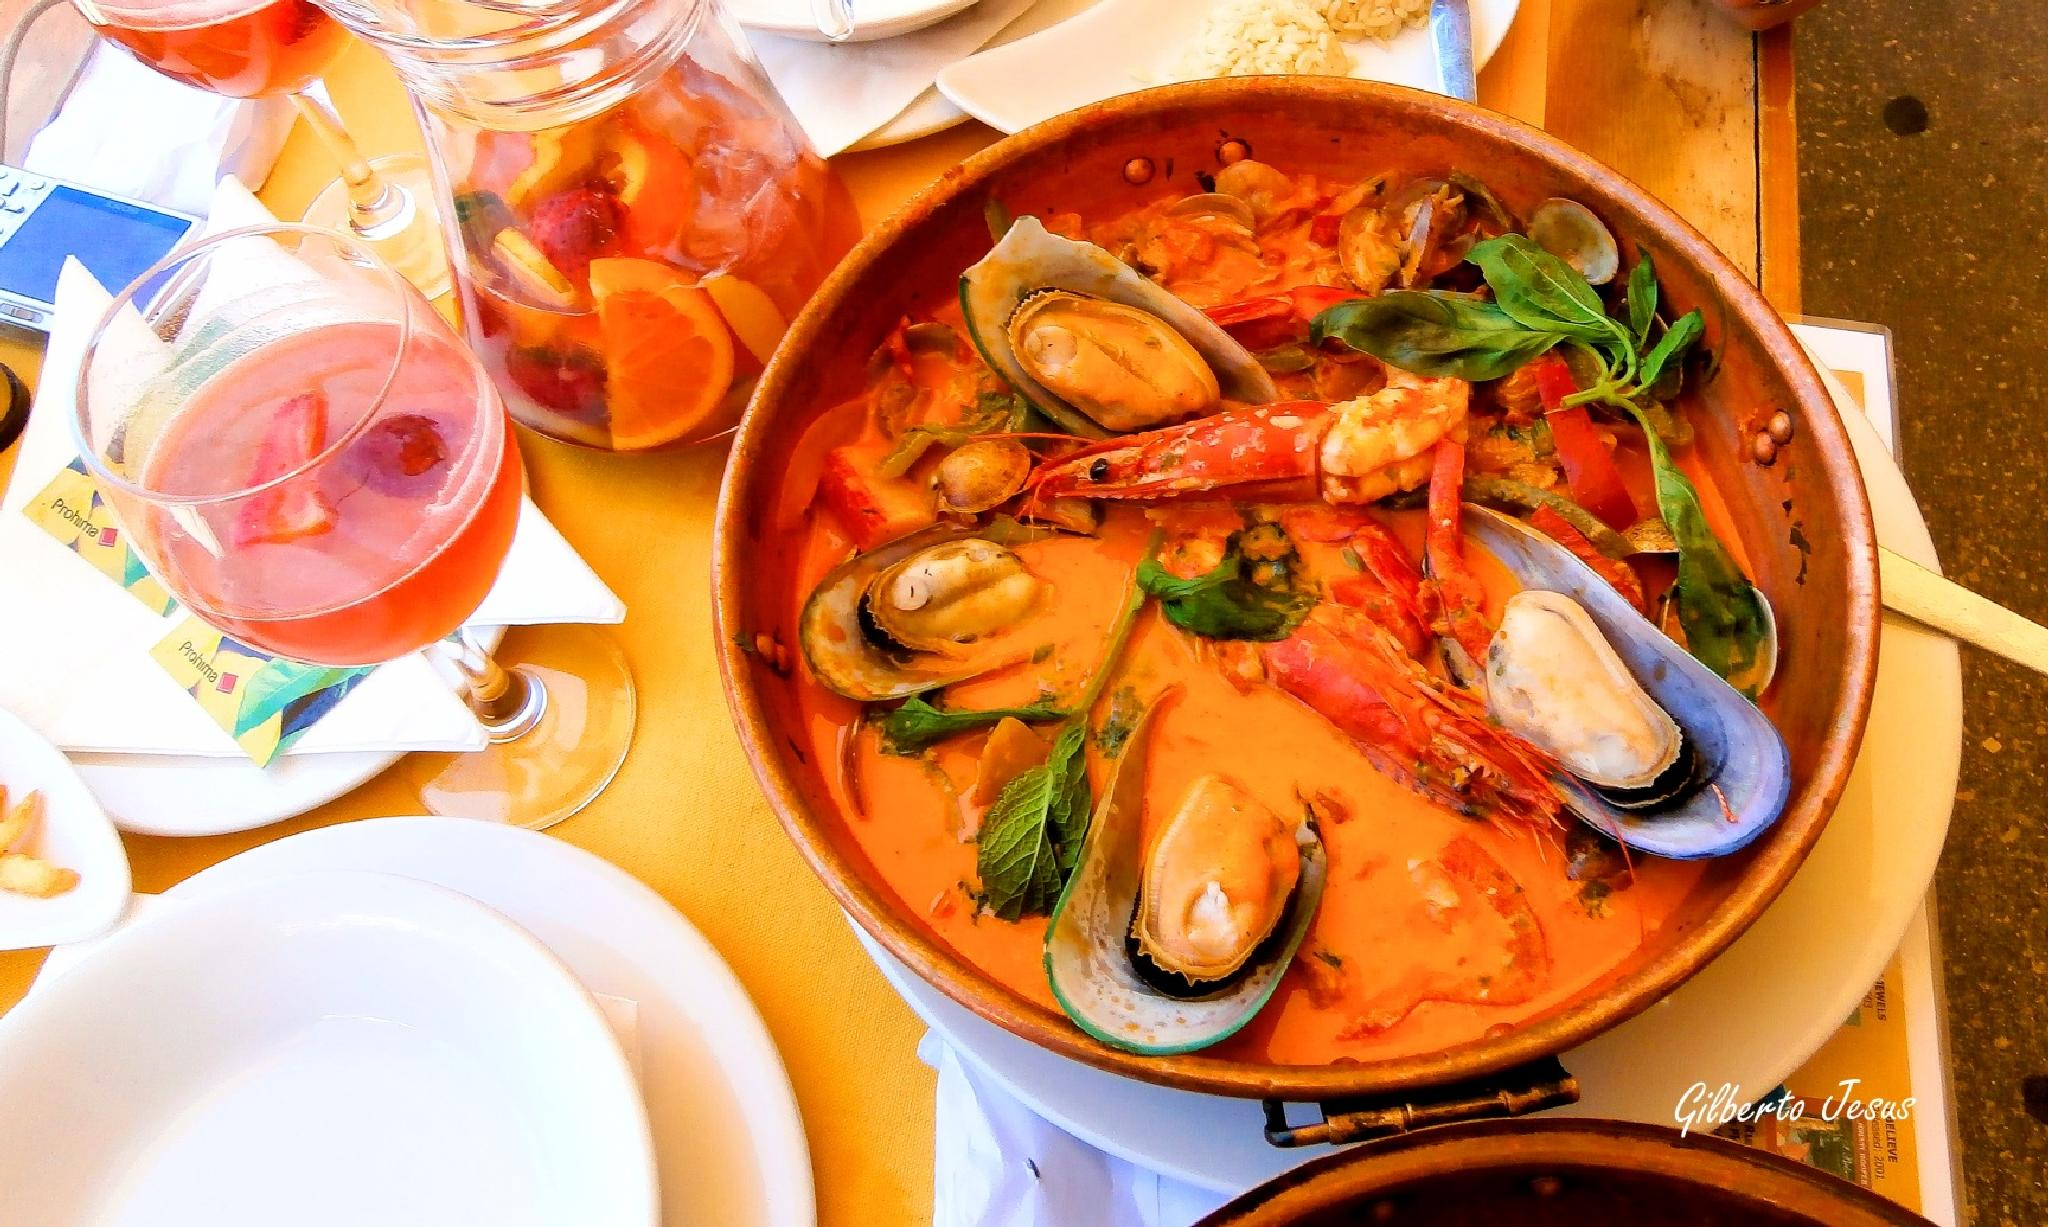 Portuguese food by Gilberto Jesus